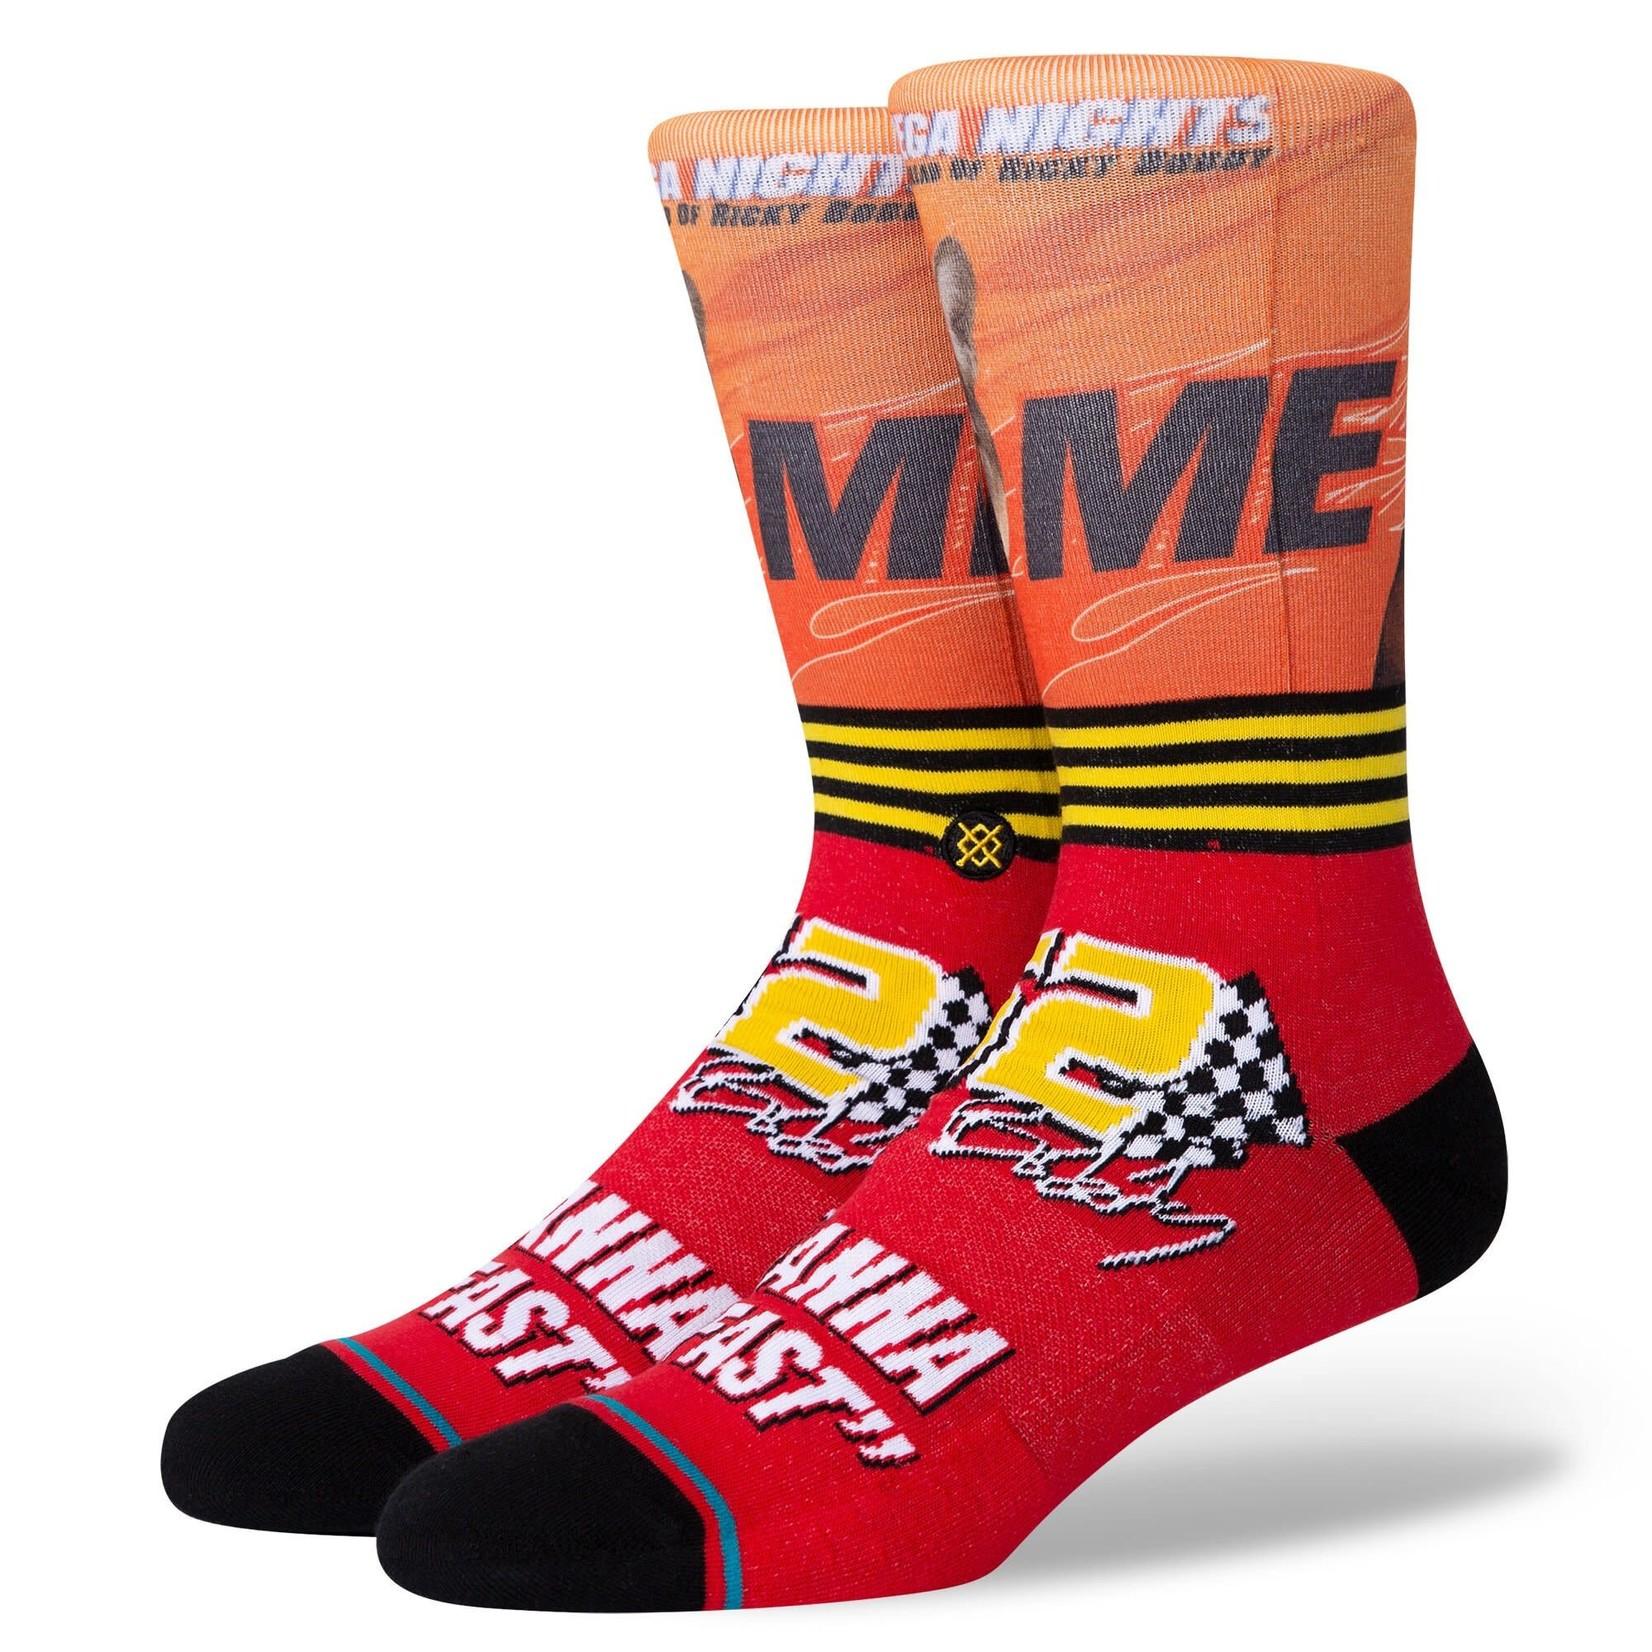 Stance Stance Socks, I Wanna Go Fast